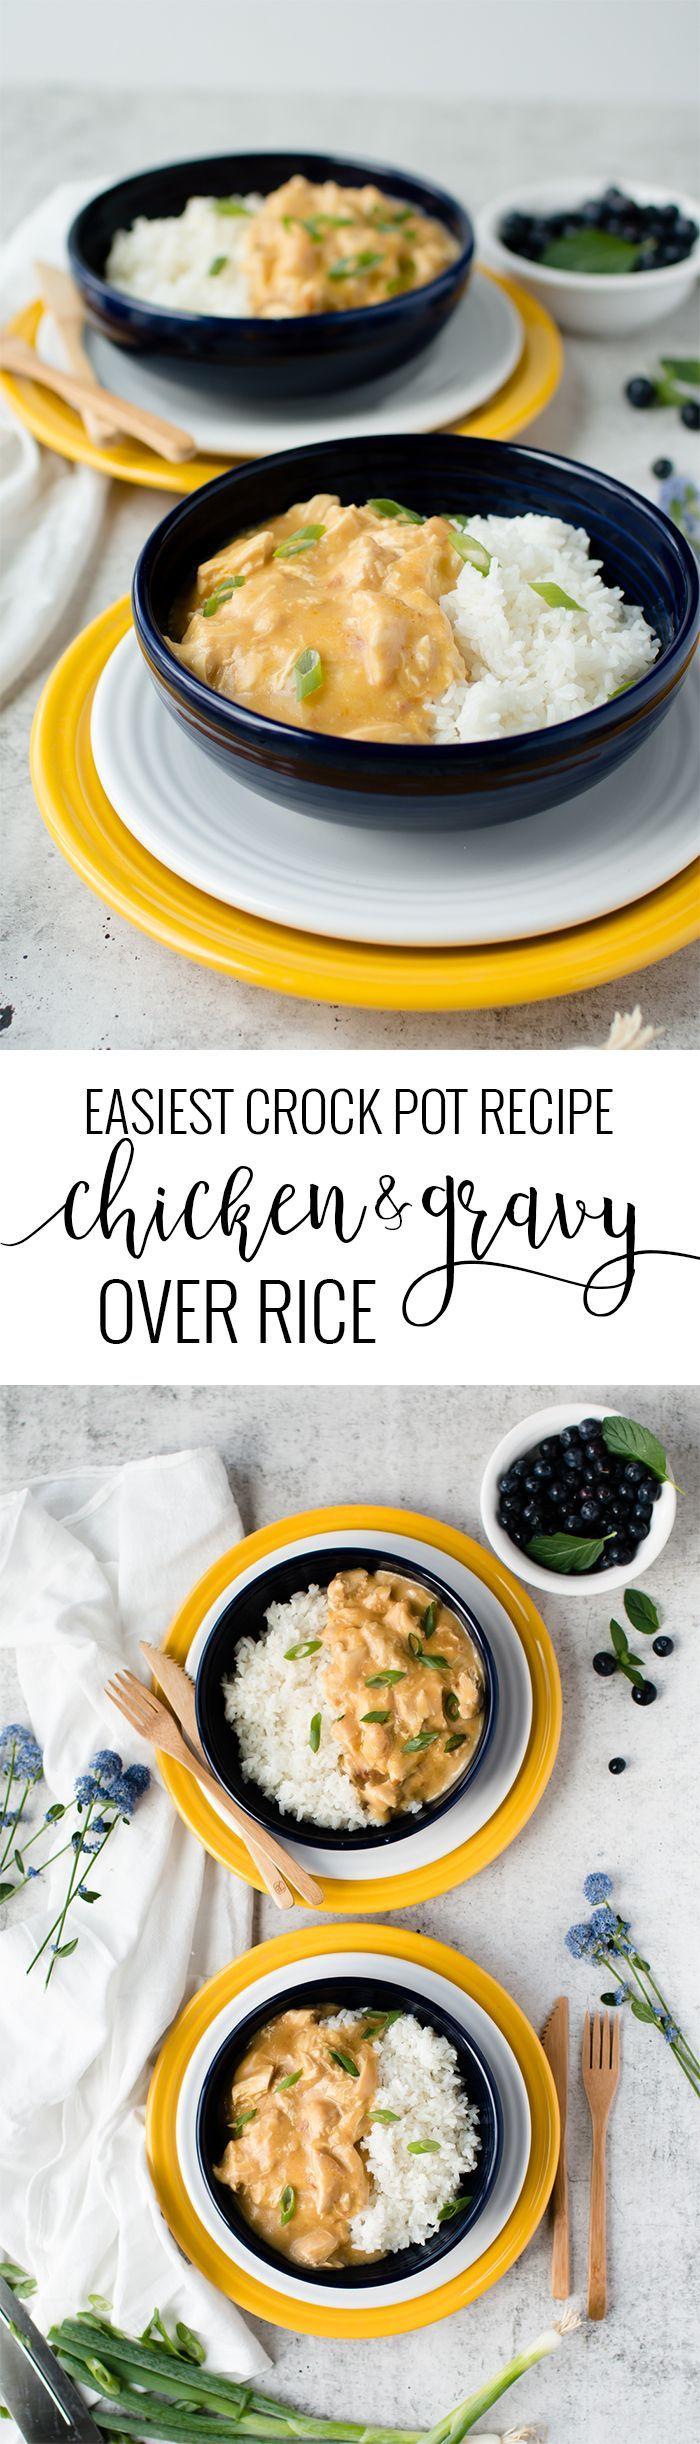 Slow Cooker Chicken & Gravy Over Rice